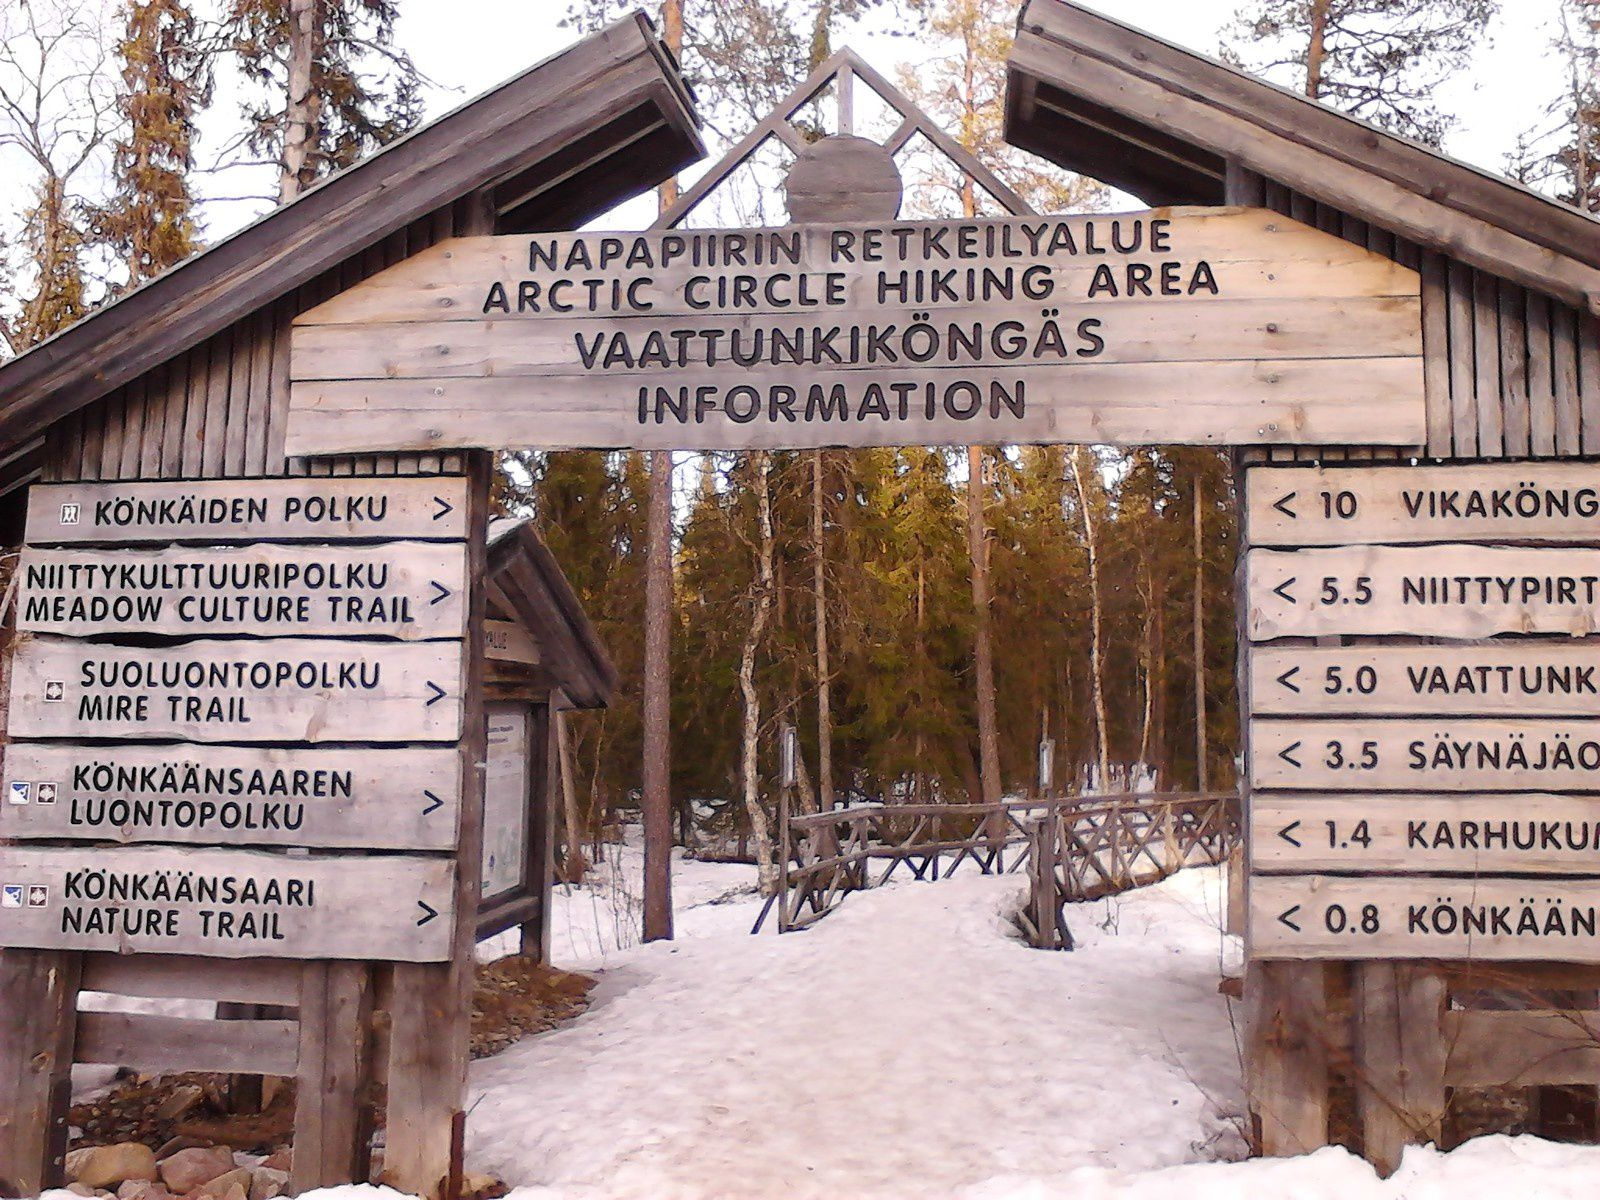 Arctic circle hiking area & unfrozen kemijoki river